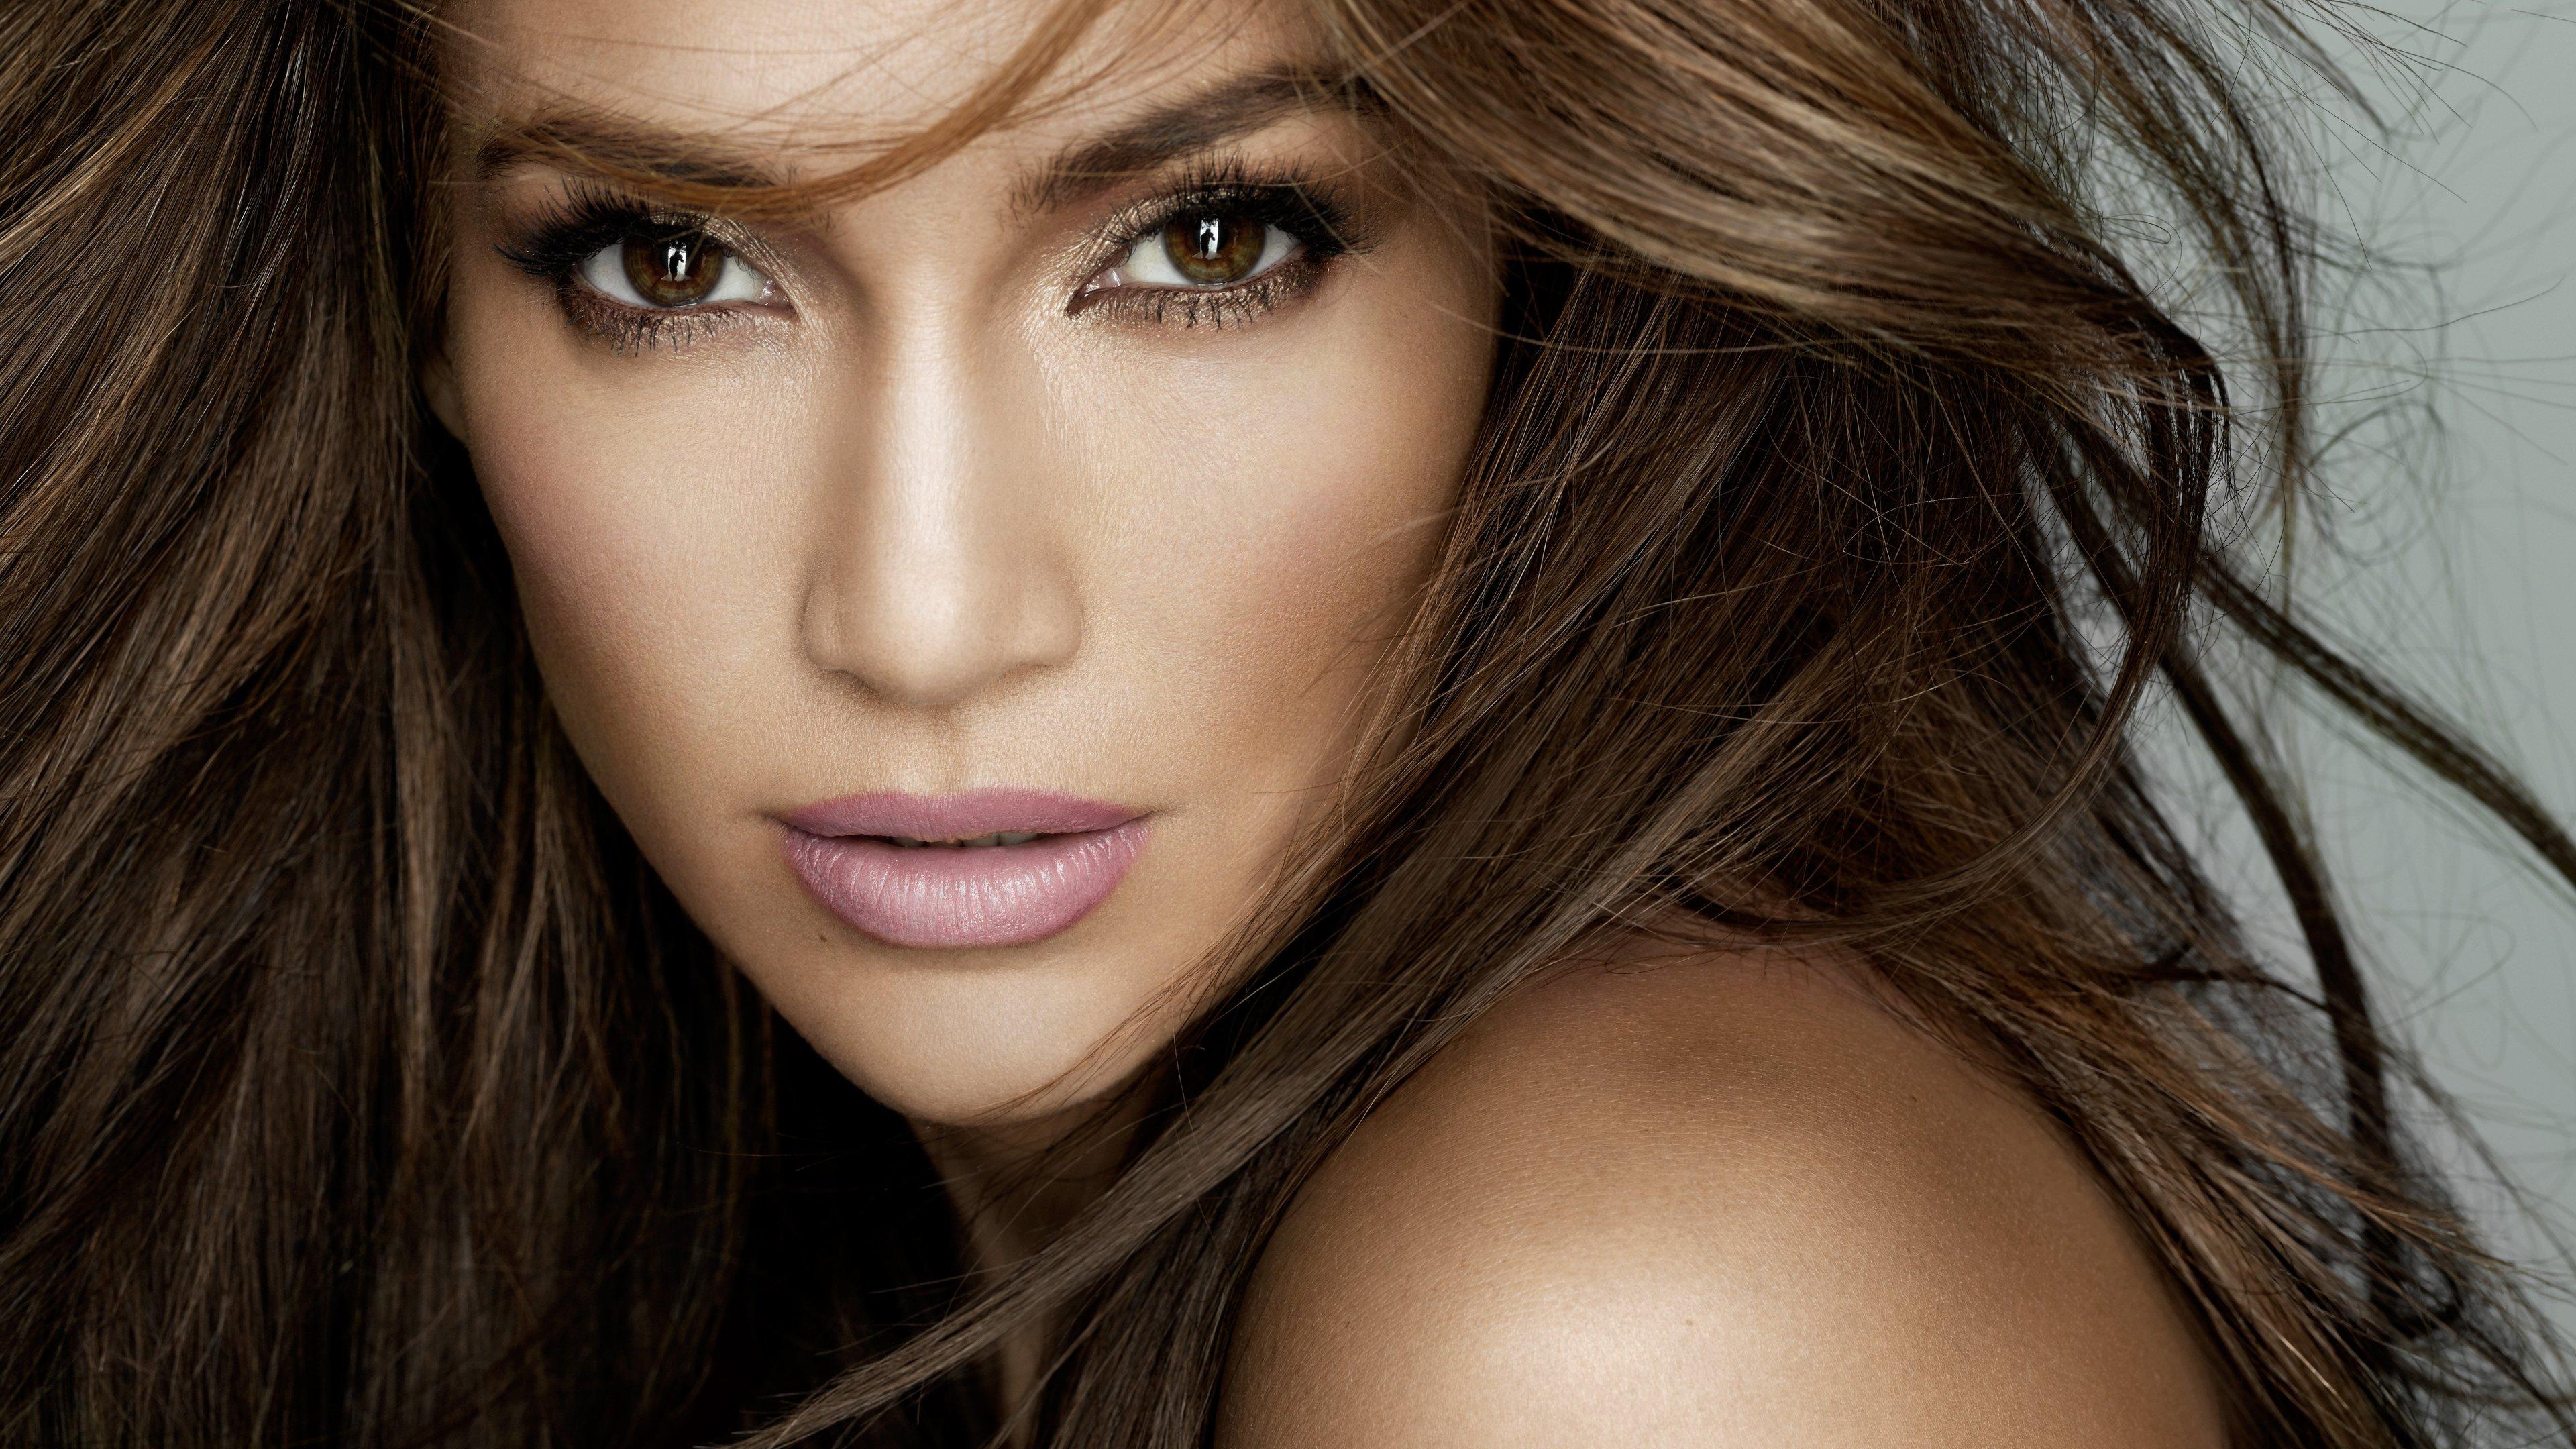 jennifer lopez 4k 2018 1542824627 - Jennifer Lopez 4k 2019 - singer wallpapers, music wallpapers, jennifer lopez wallpapers, hd-wallpapers, girls wallpapers, celebrities wallpapers, 4k-wallpapers